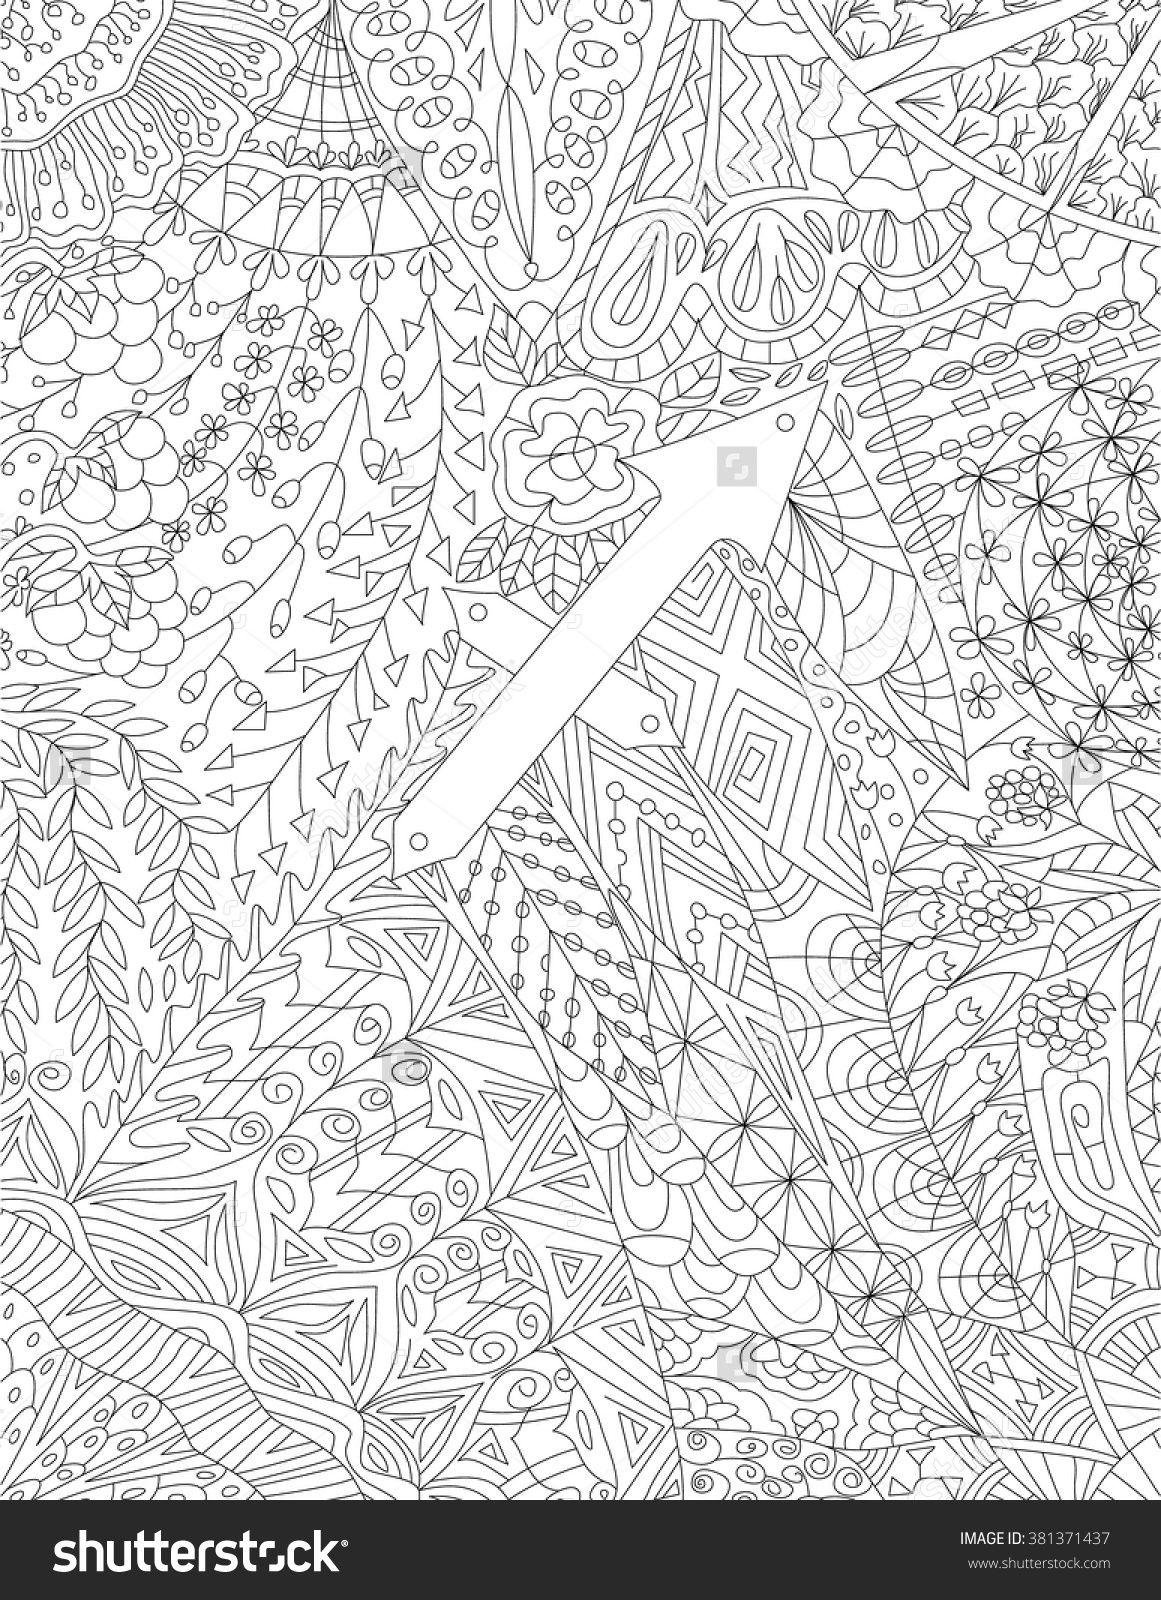 zodiac sign sagittarius floral geometric doodle pattern coloring